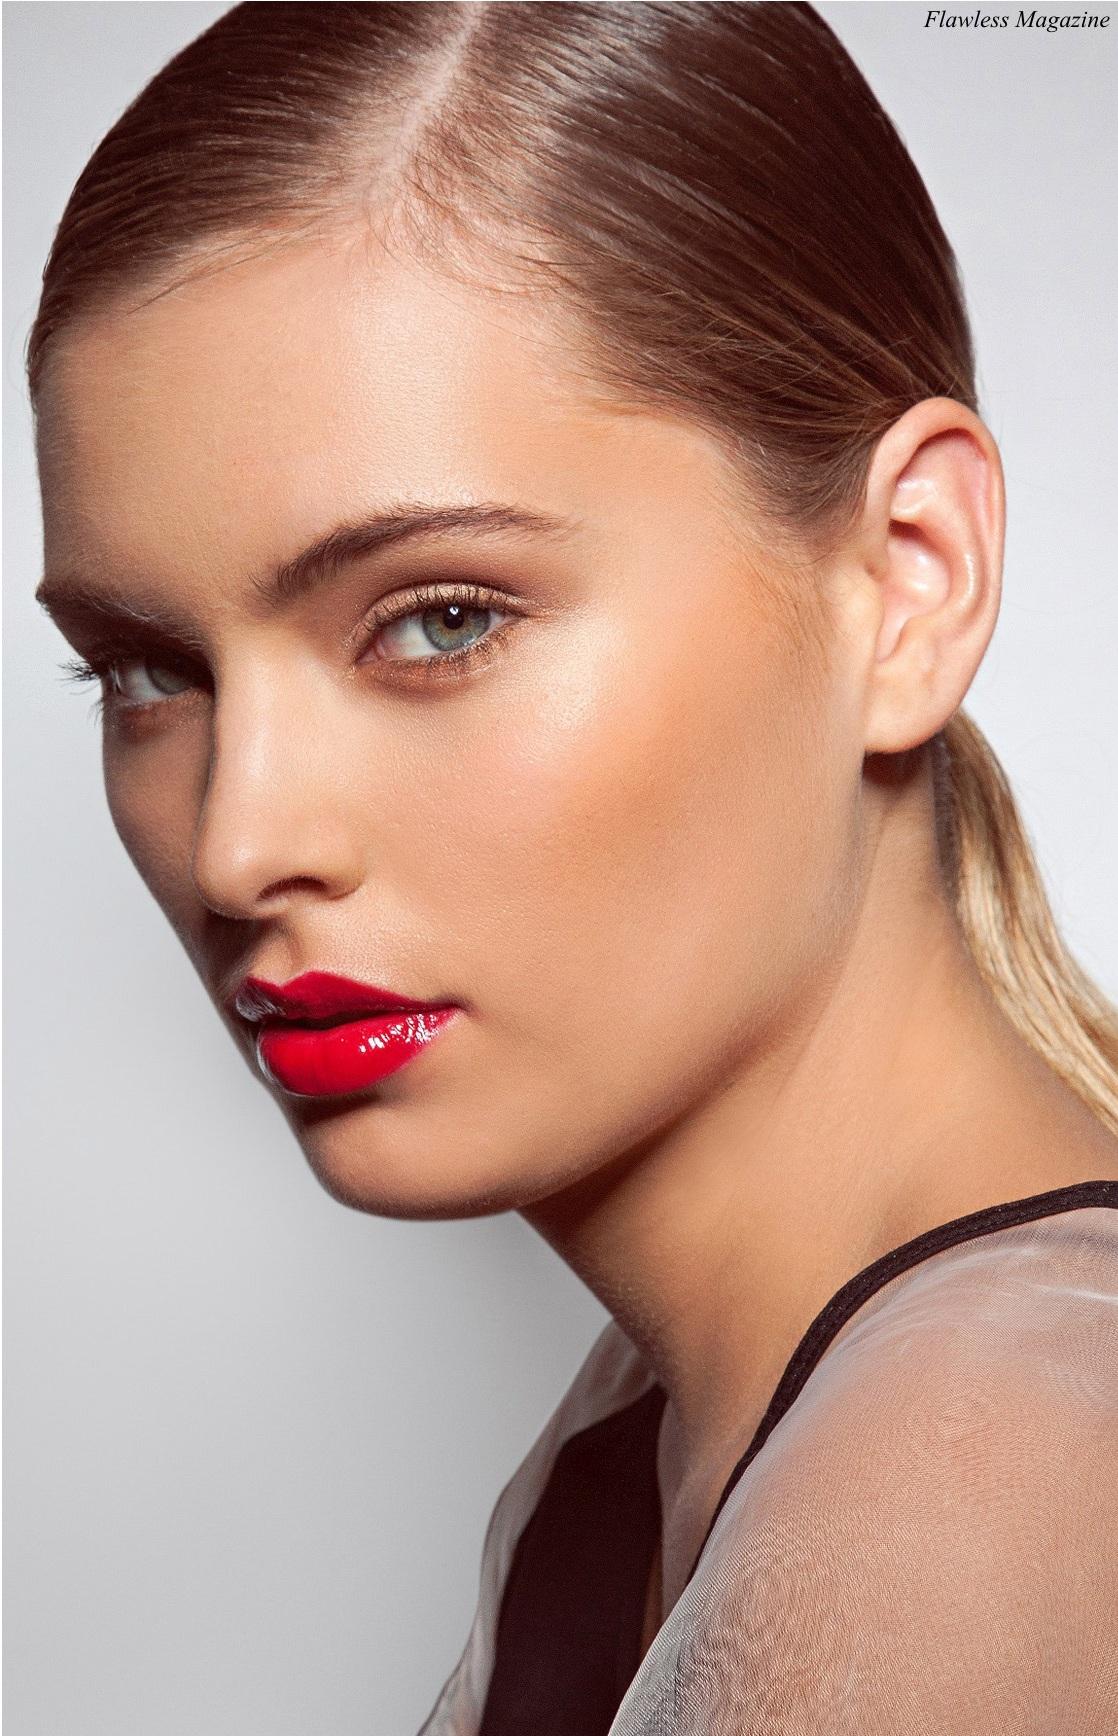 Flawless-Magazine_Subtle-Beautycrop-copy.jpg